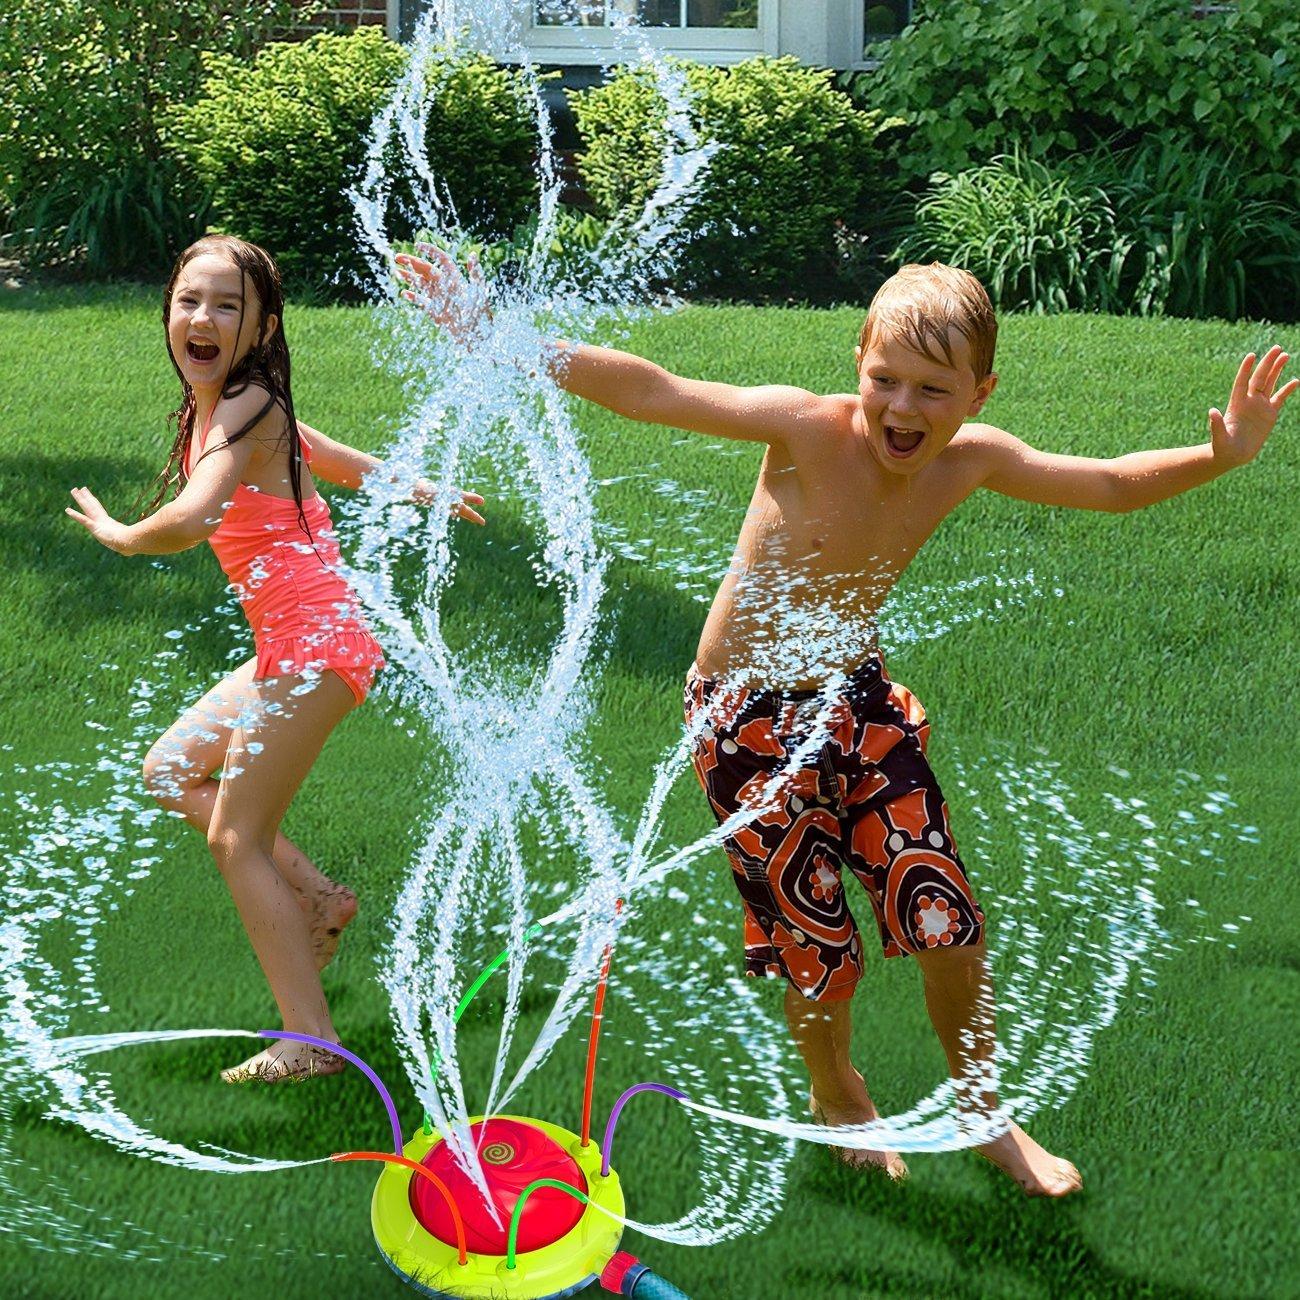 Hydro Swirl Spinning Sprinkler